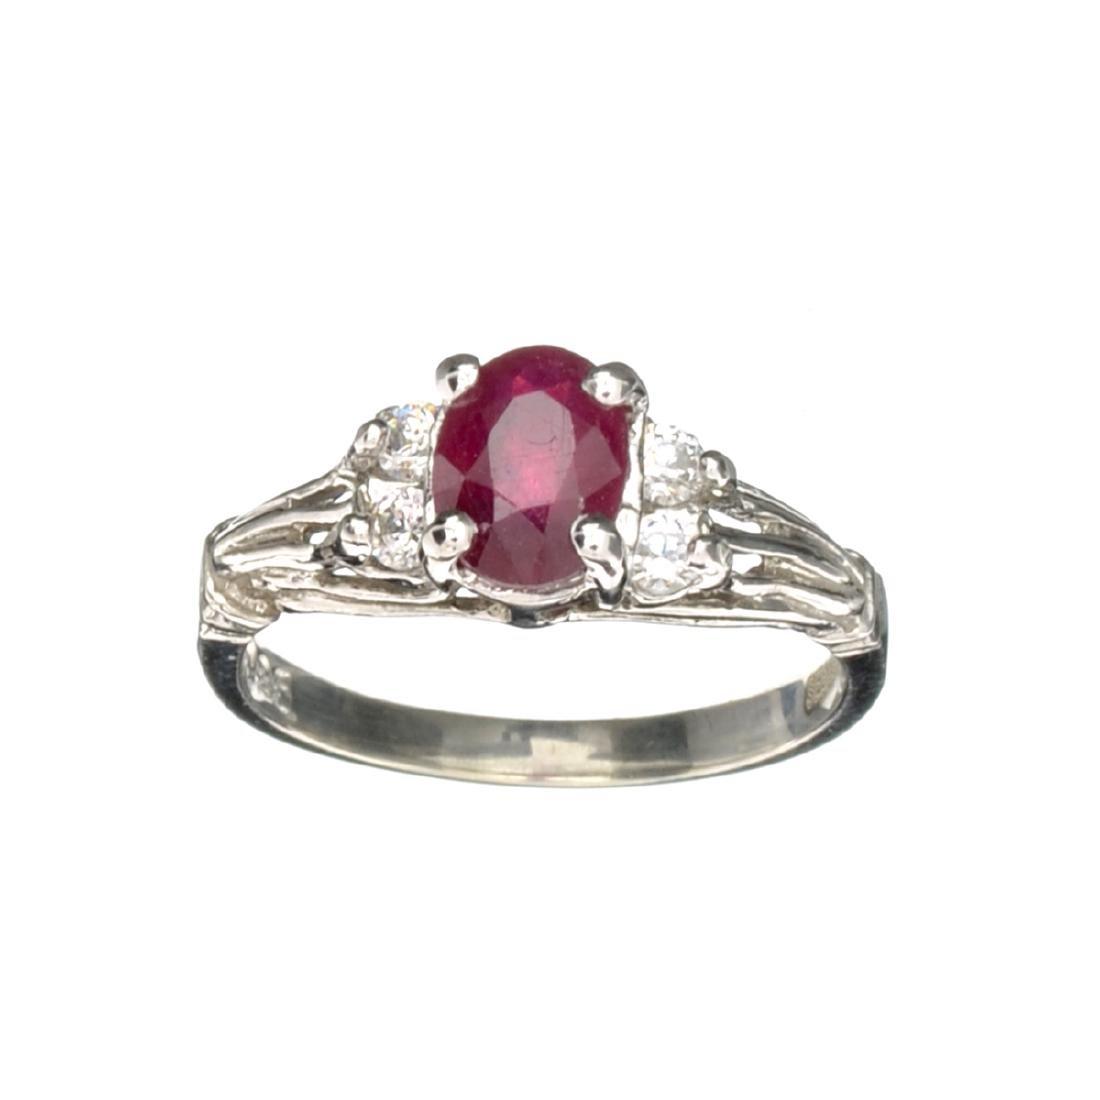 APP: 0.5k Fine Jewelry Designer Sebastian, 1.45CT Ruby